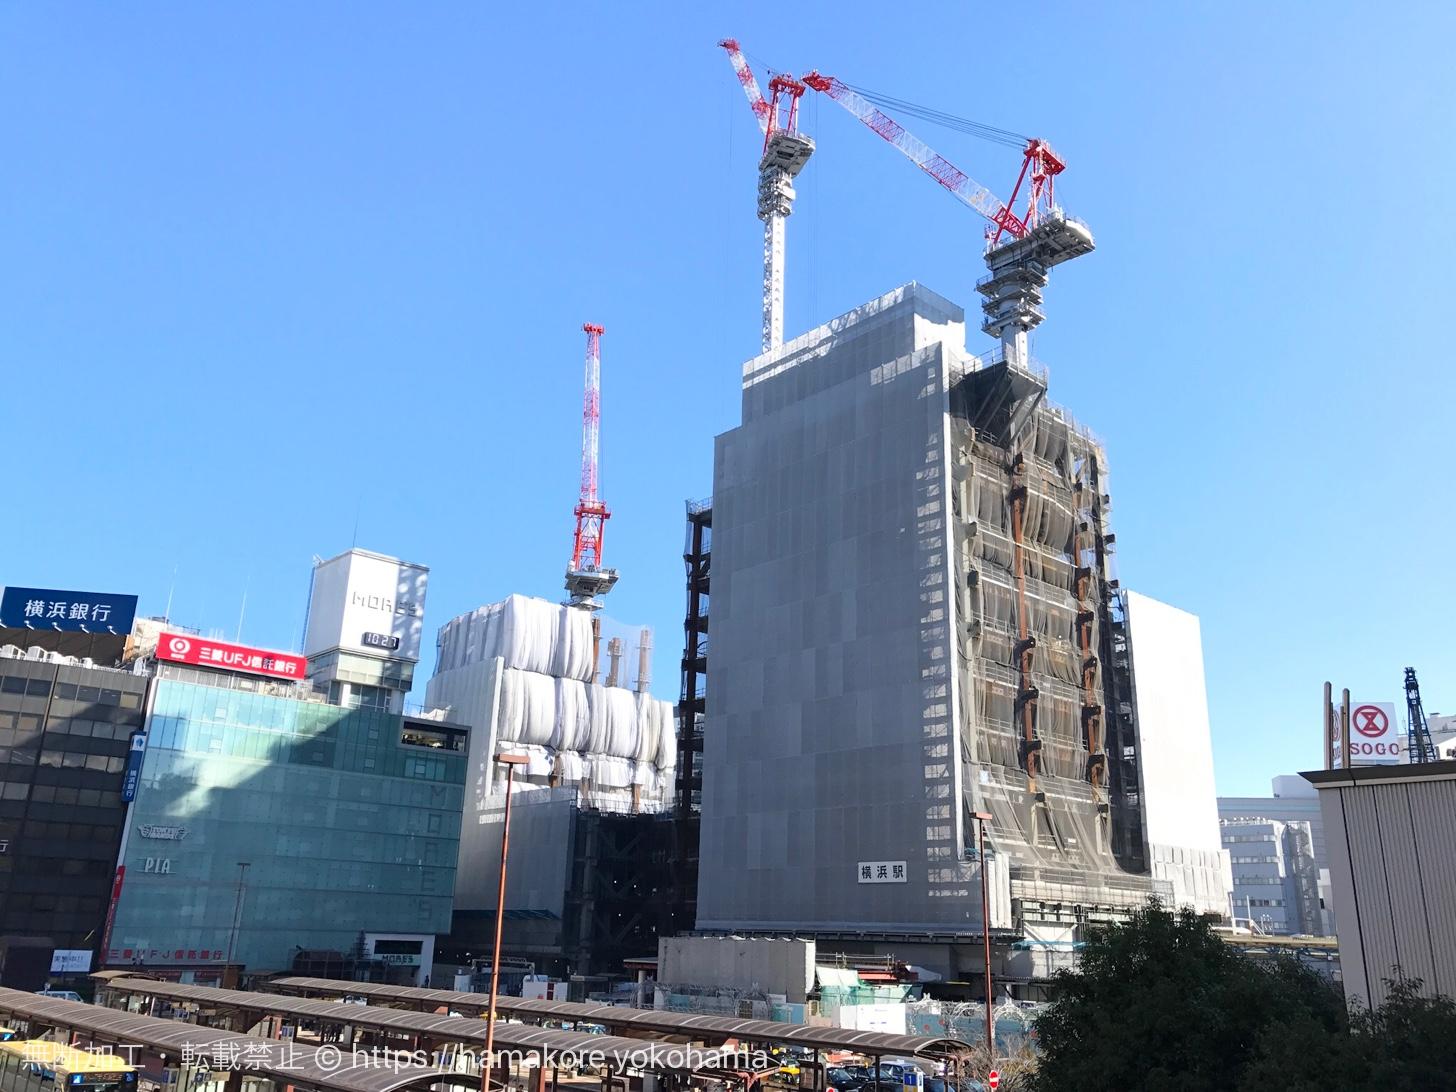 2017年11月 横浜駅西口の様子